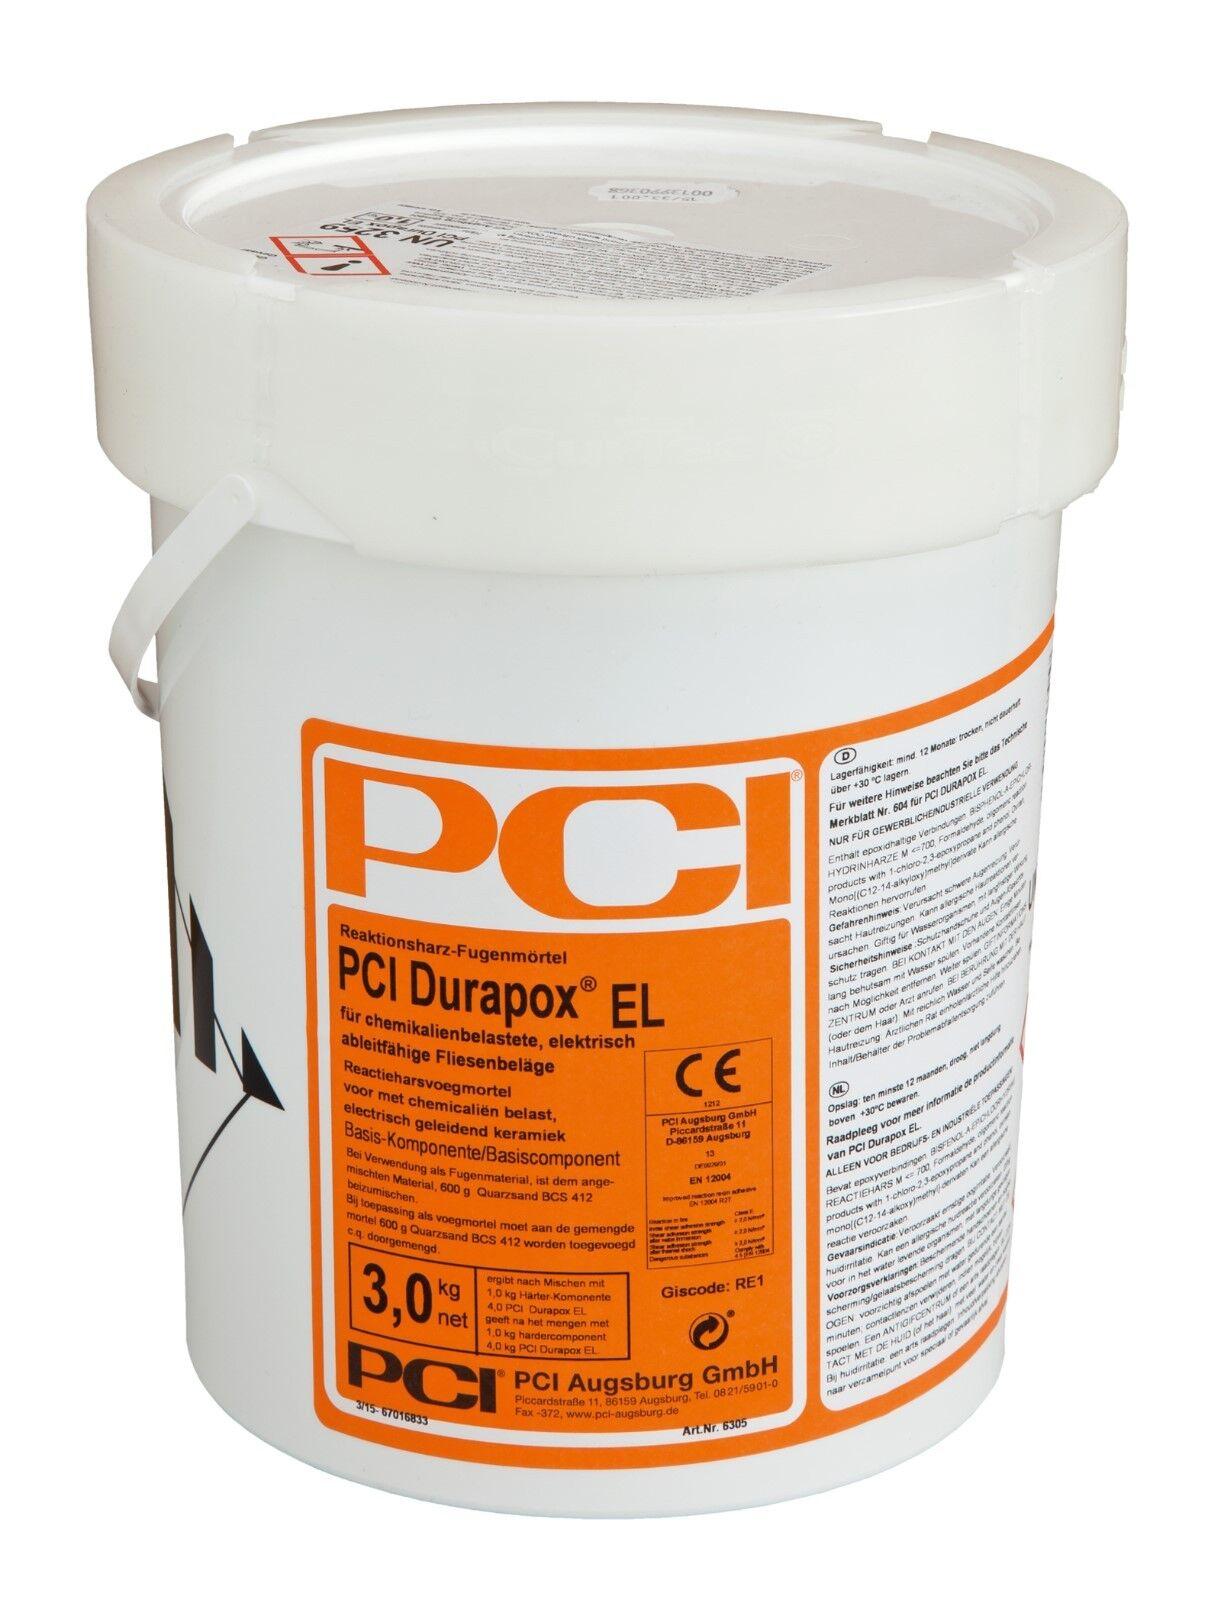 pci durapox el 8.8 lbs reaktionsharzmörtel in black tile adhesive